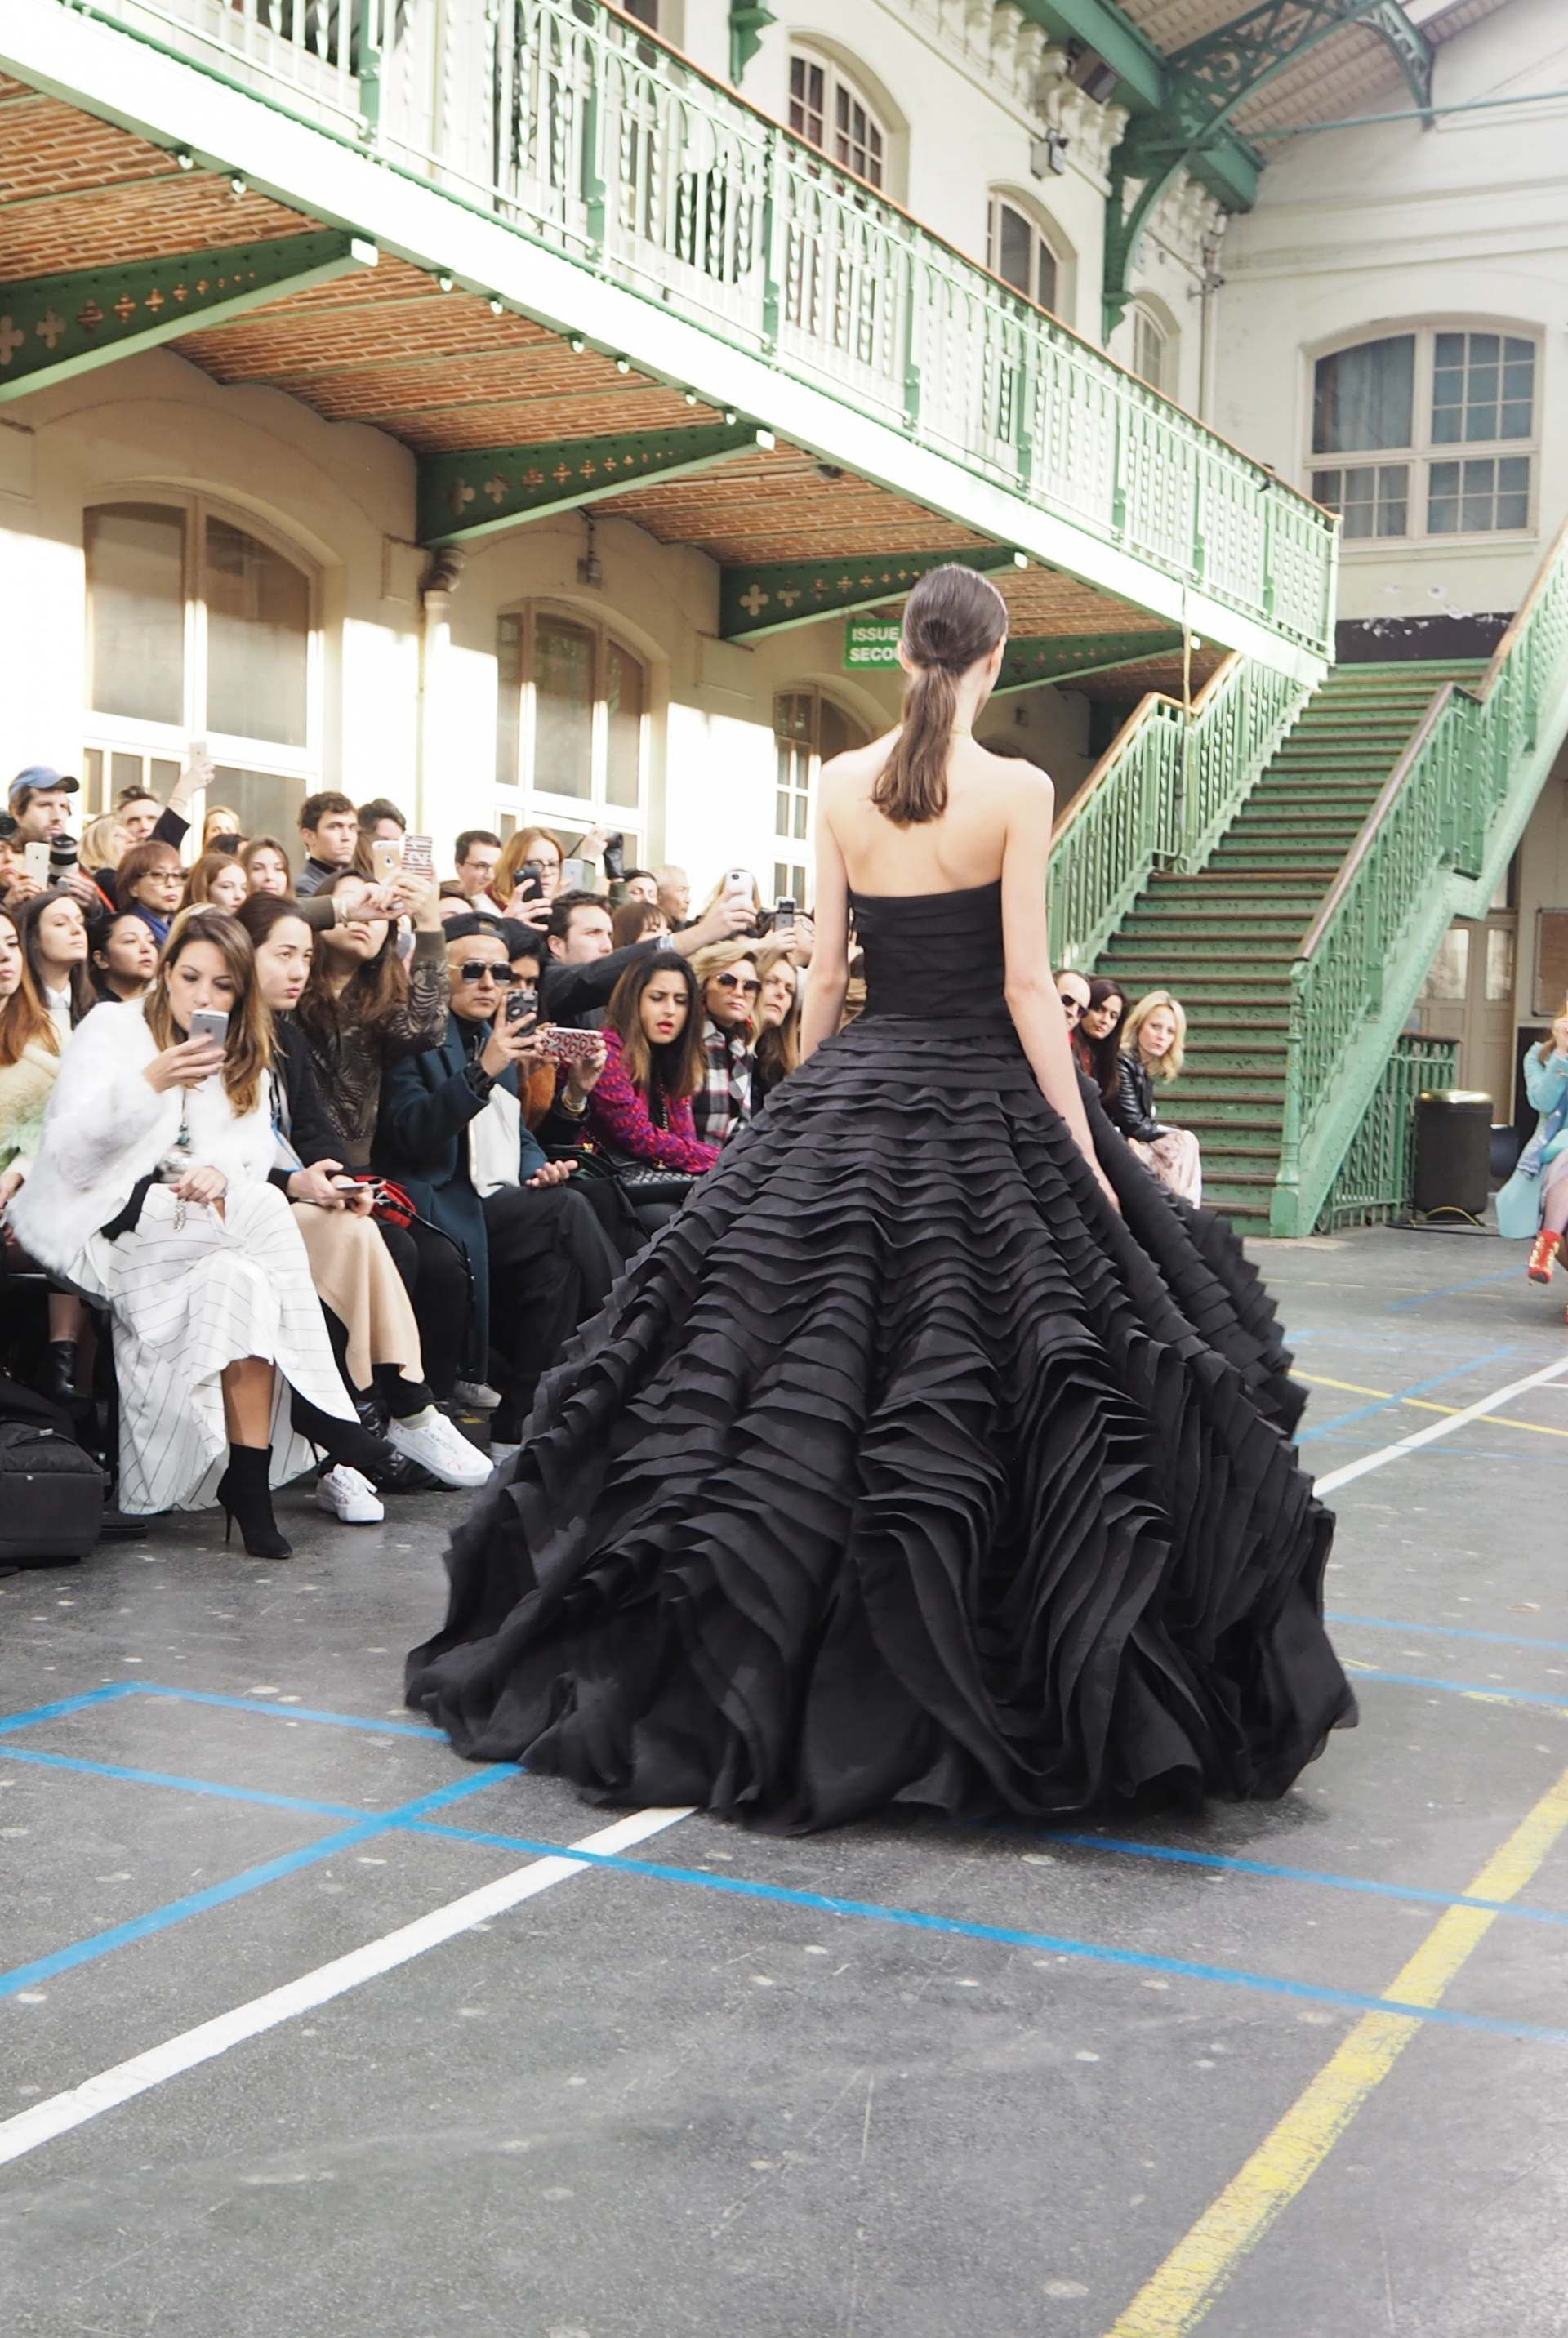 20bcf0a0bdd1 Paris Fashion Week  Diary Edition